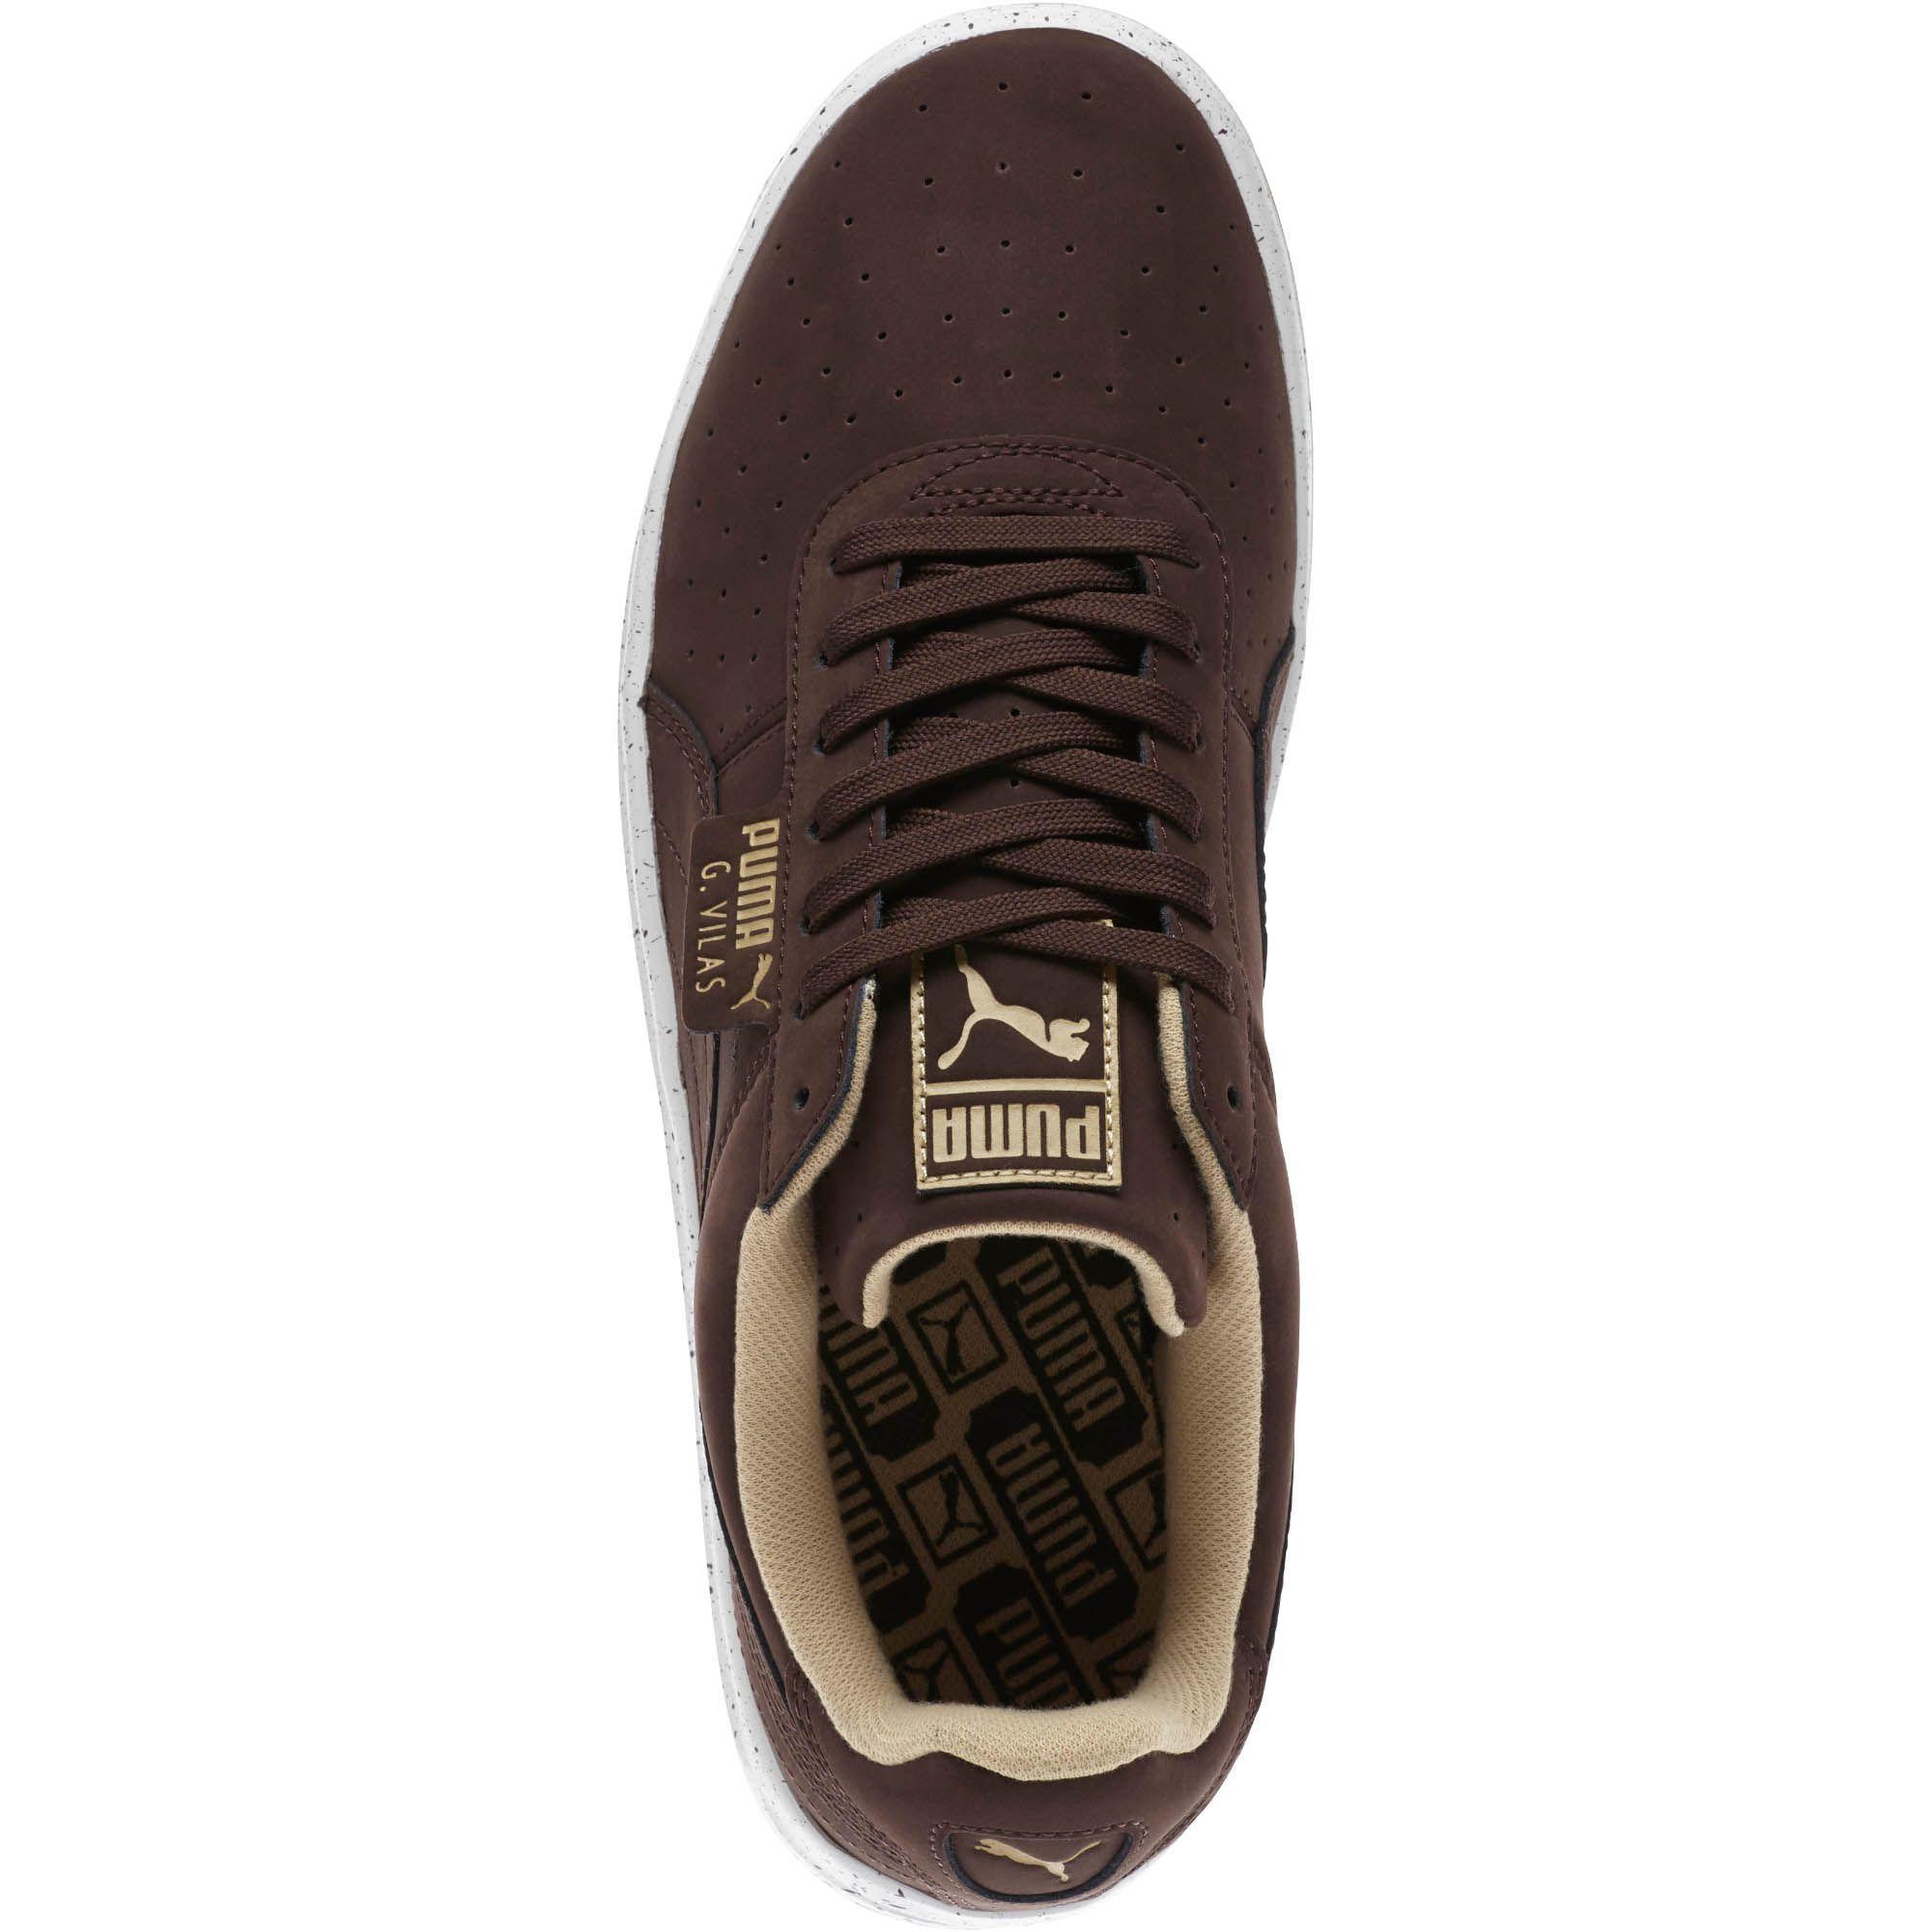 f6247c79d5c01 PUMA Brown G. Vilas Nubuck Speckle Men's Sneakers for men